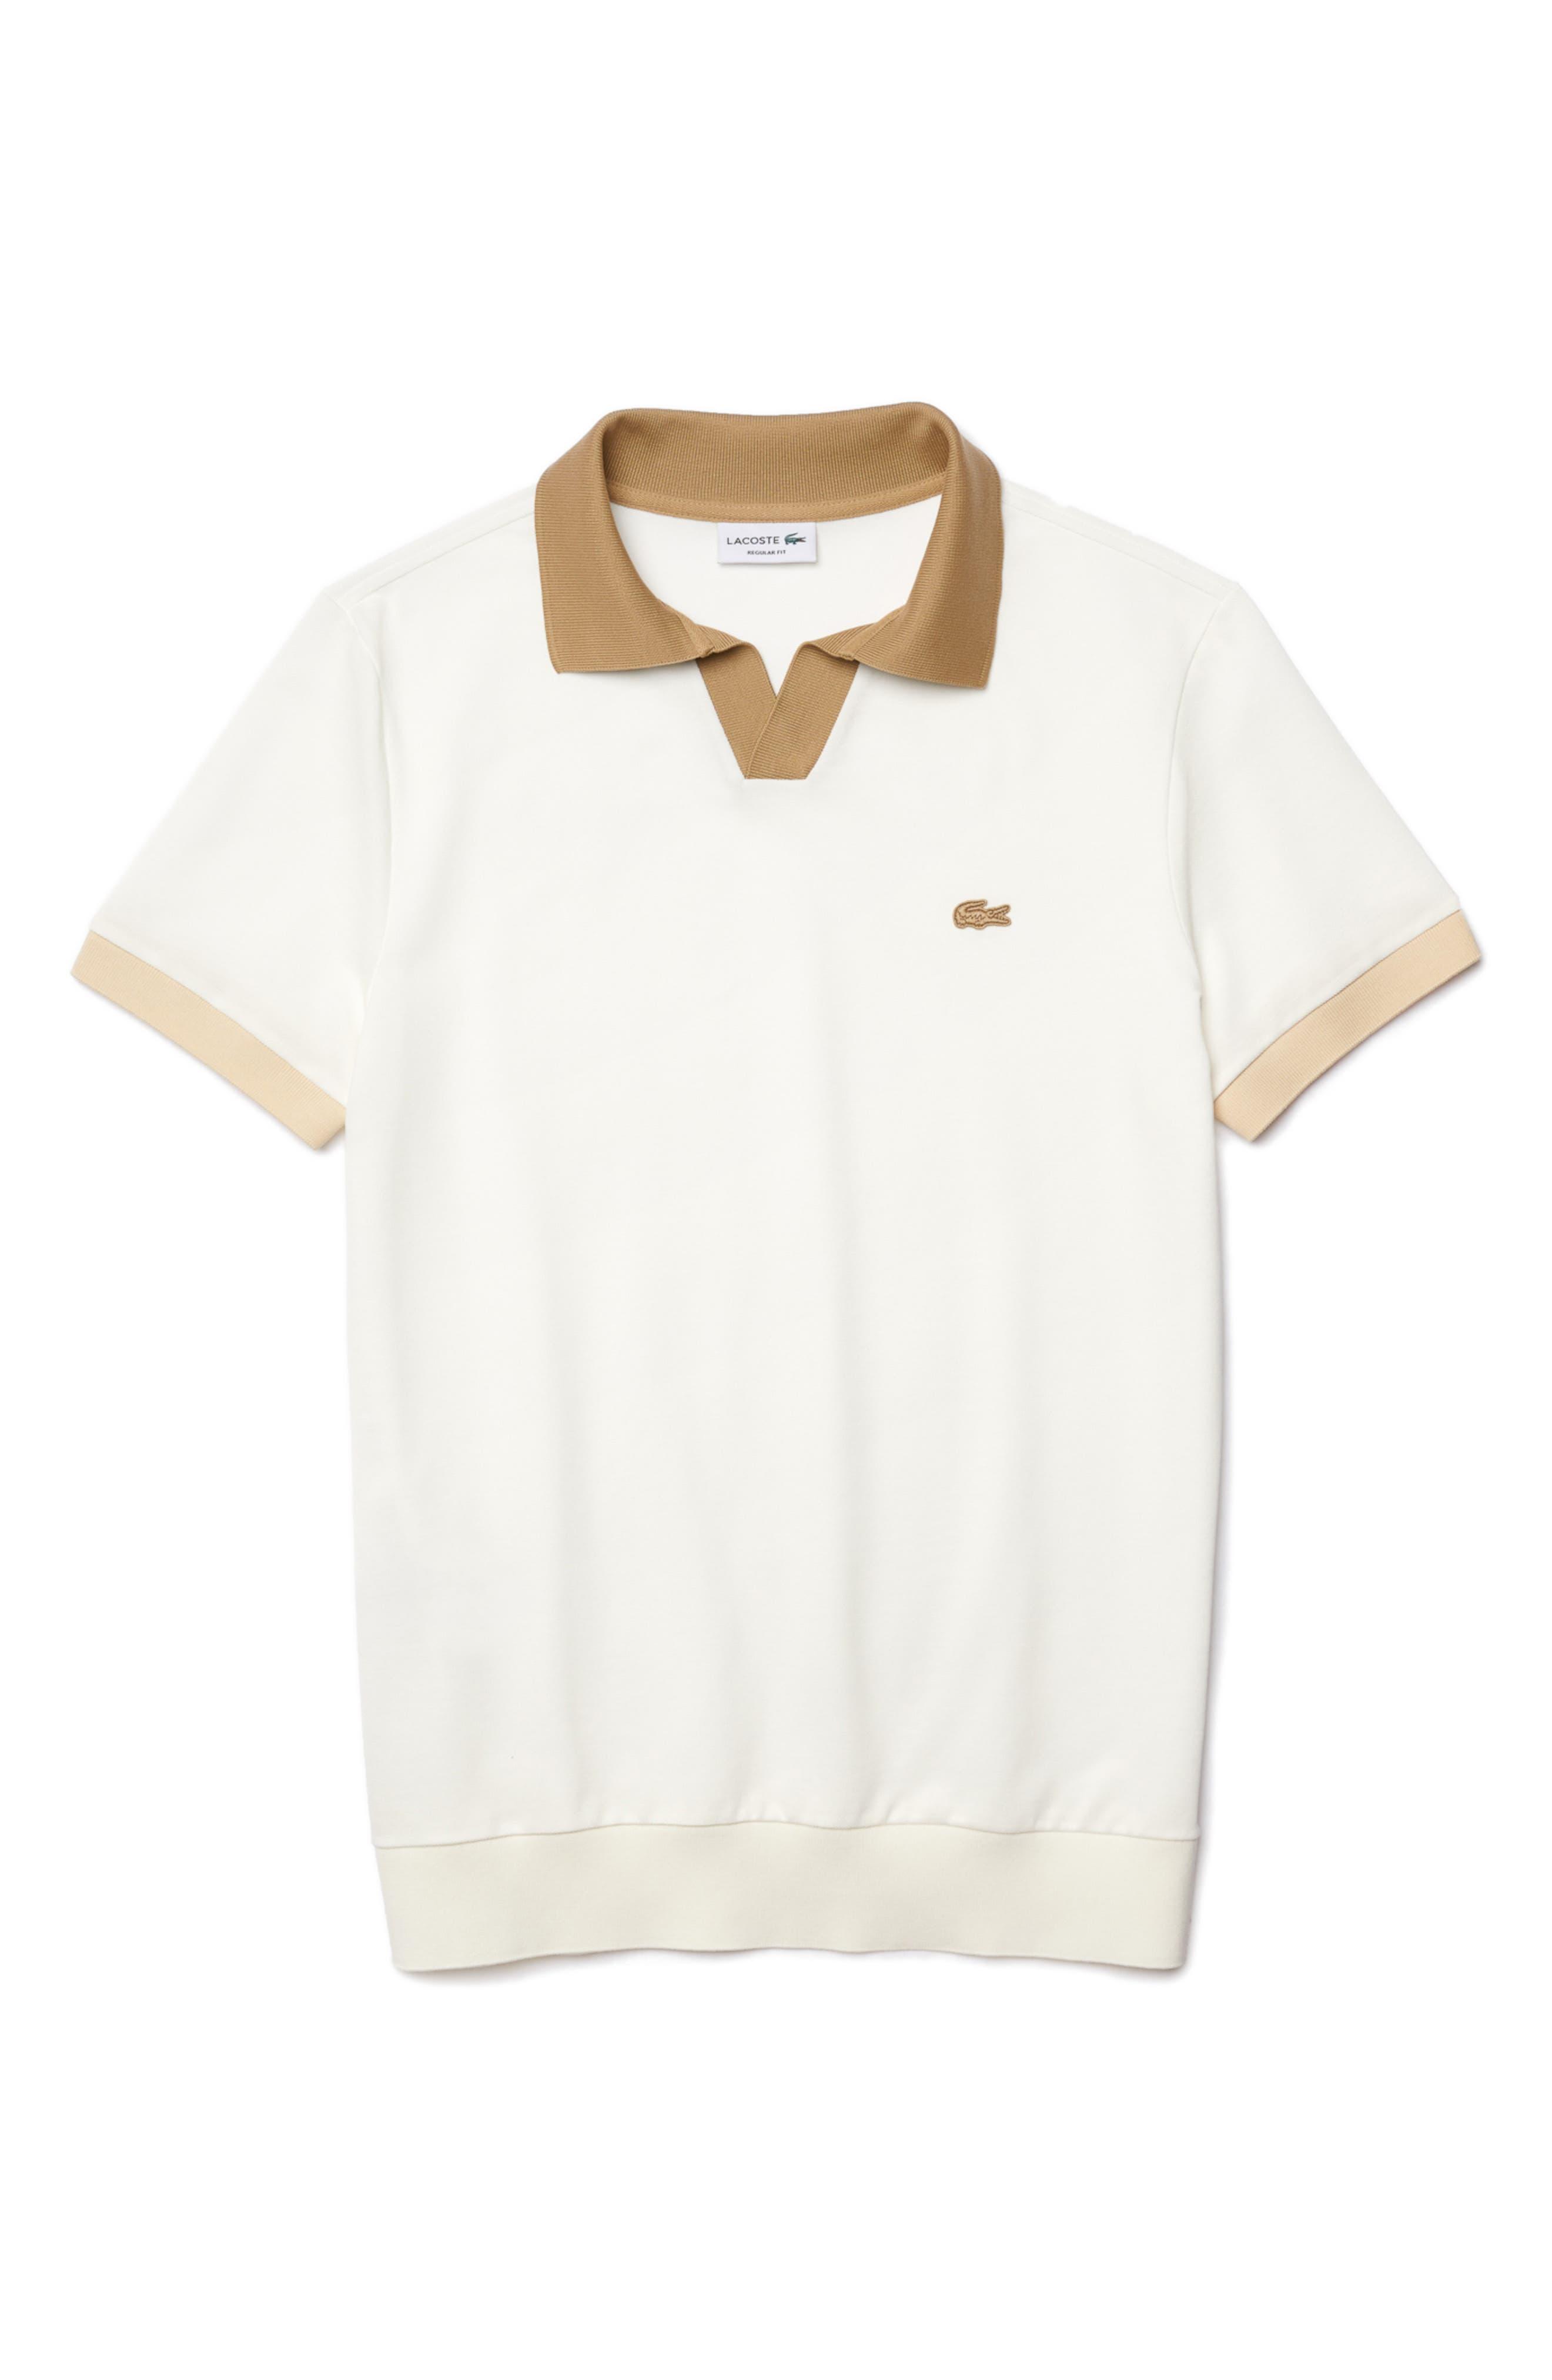 1930s Mens Shirts | Dress Shirts, Polo Shirts, Work Shirts Mens Lacoste Johnny Collar Pique Polo Size 3 - Blue $135.00 AT vintagedancer.com